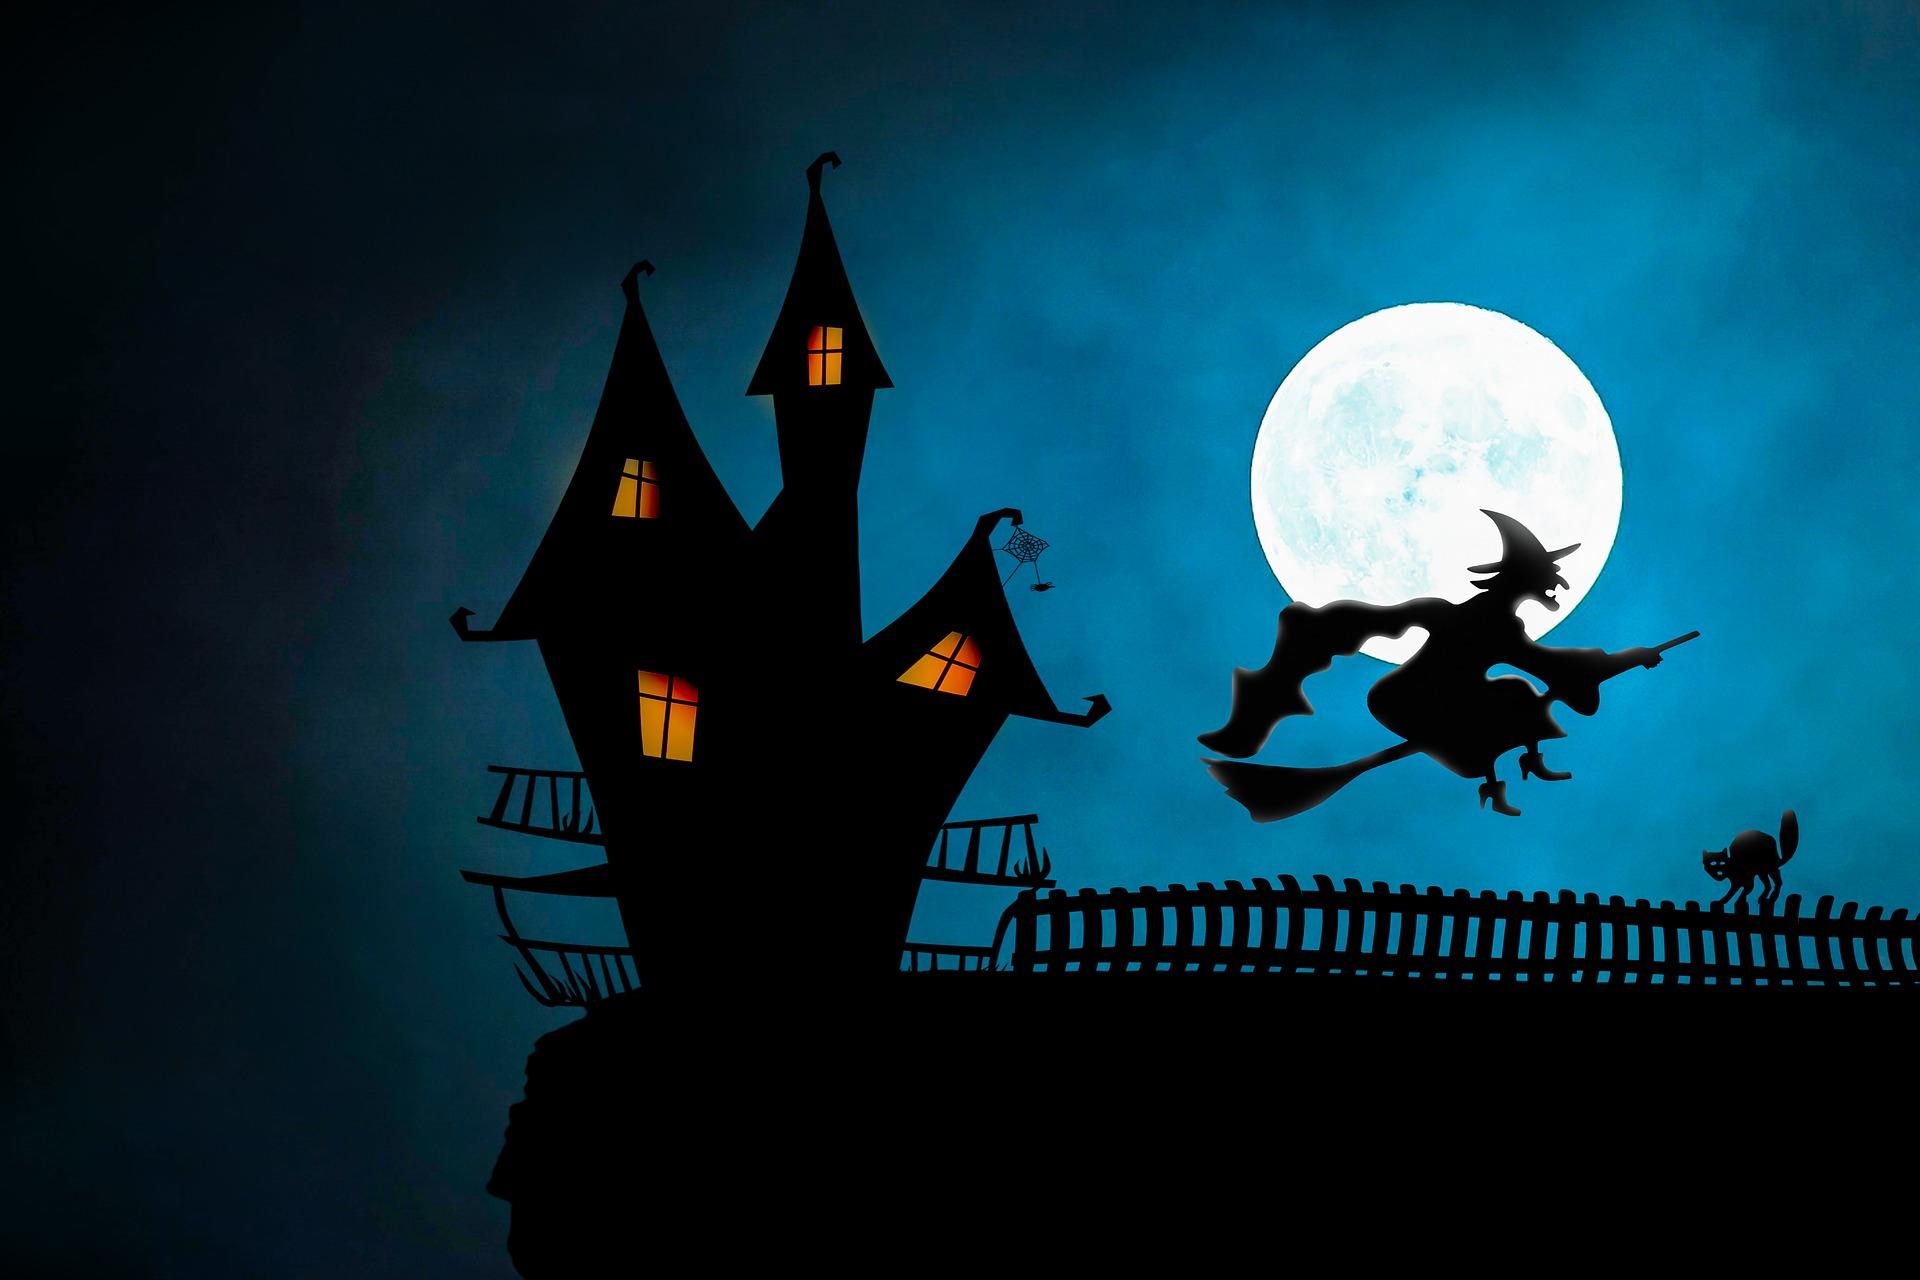 Las Apps Mas Terrorificas Para Celebrar O Felicitar Halloween Blog - Imagenes-terrorificas-de-halloween